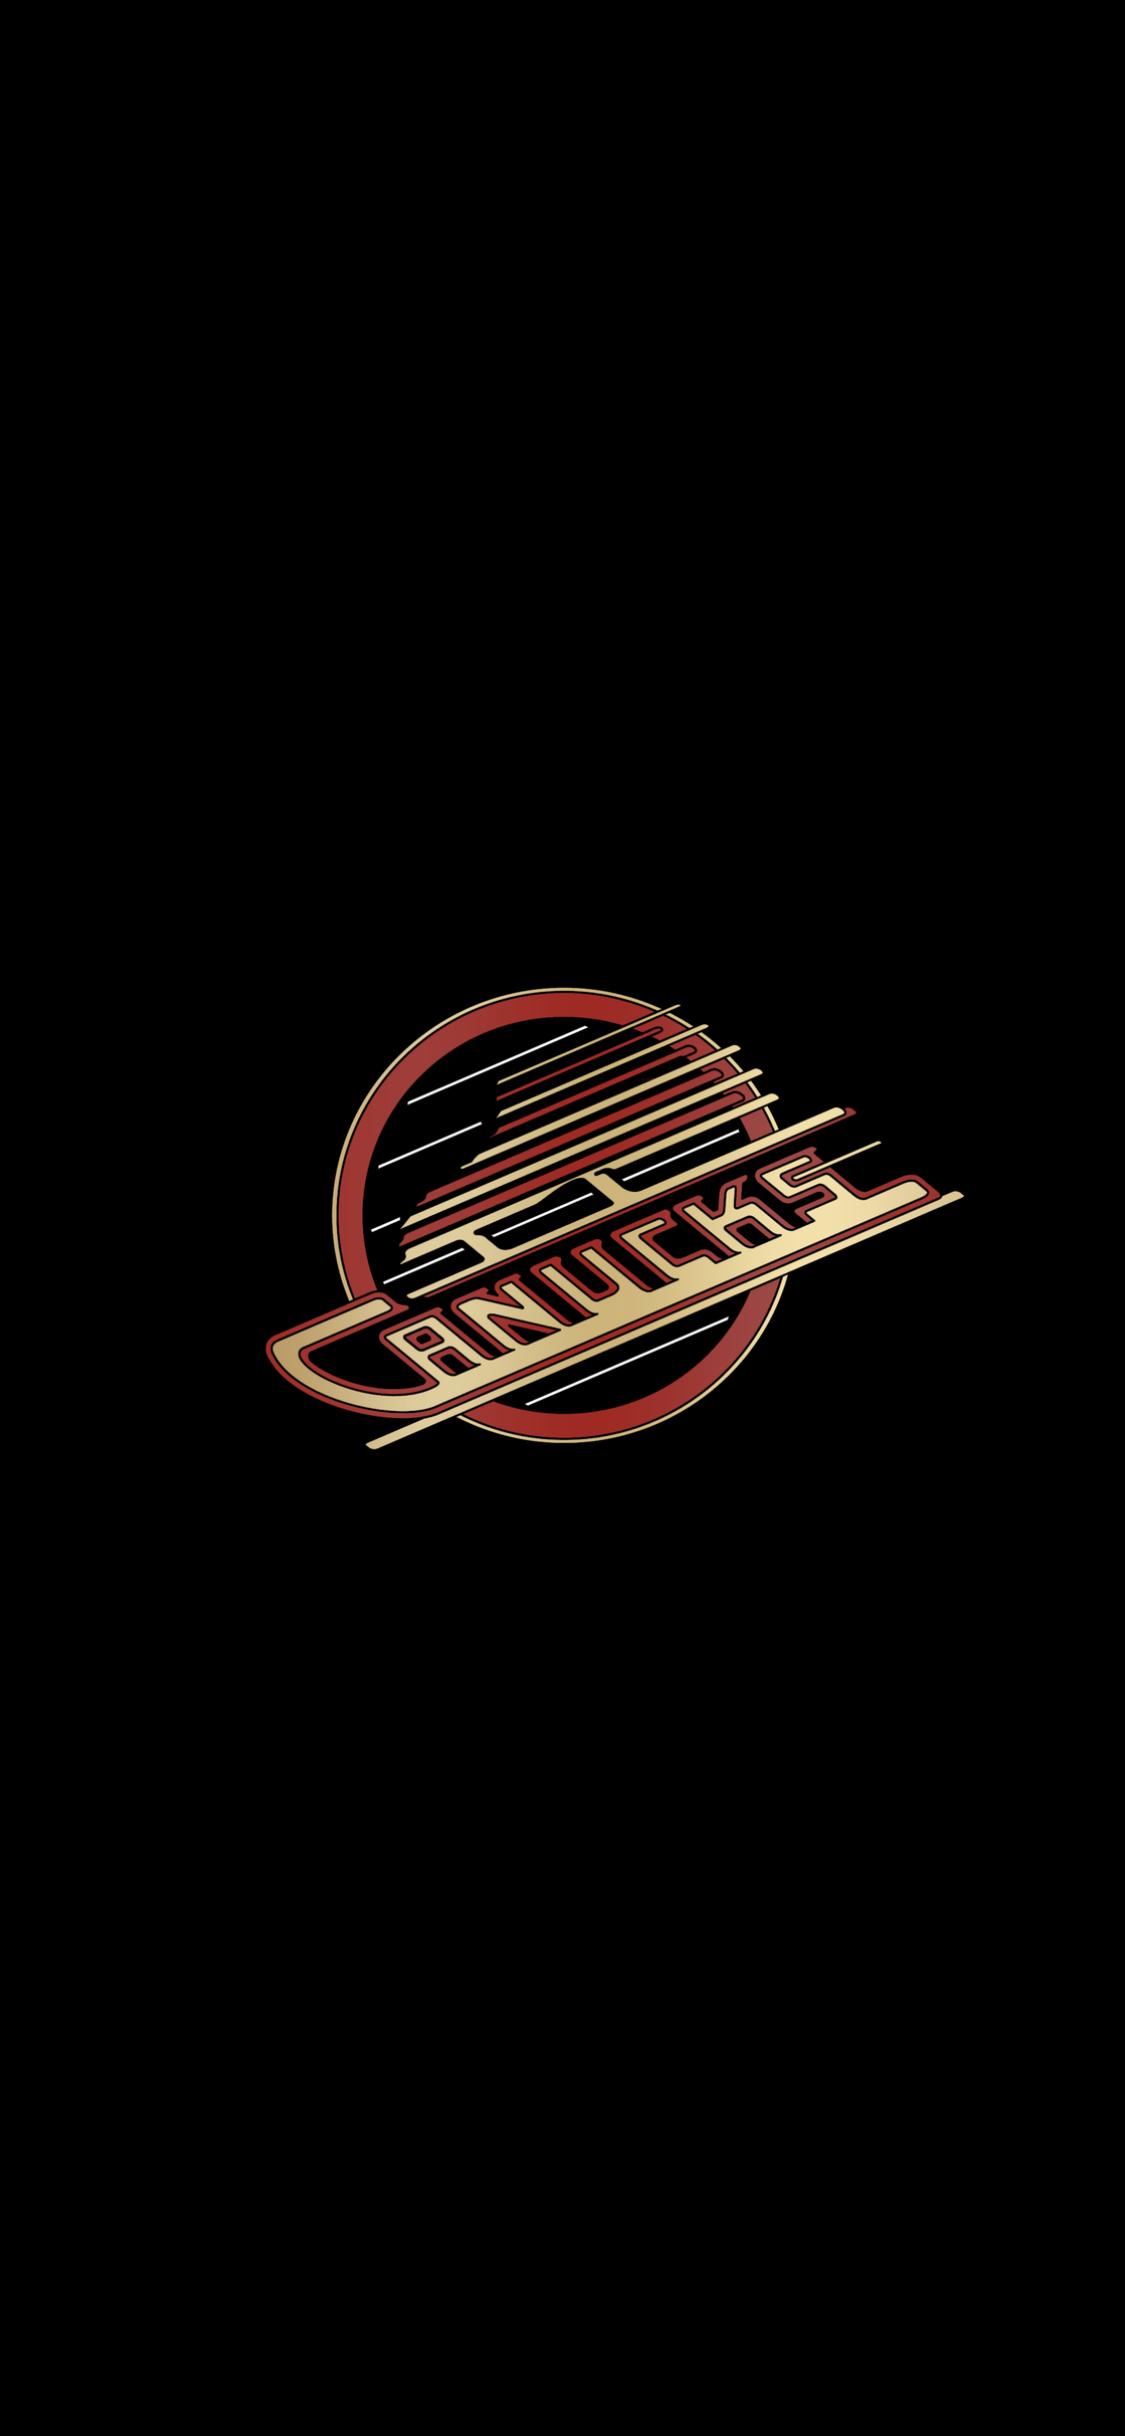 Canucks Skate Logo 2602605 Hd Wallpaper Backgrounds Download